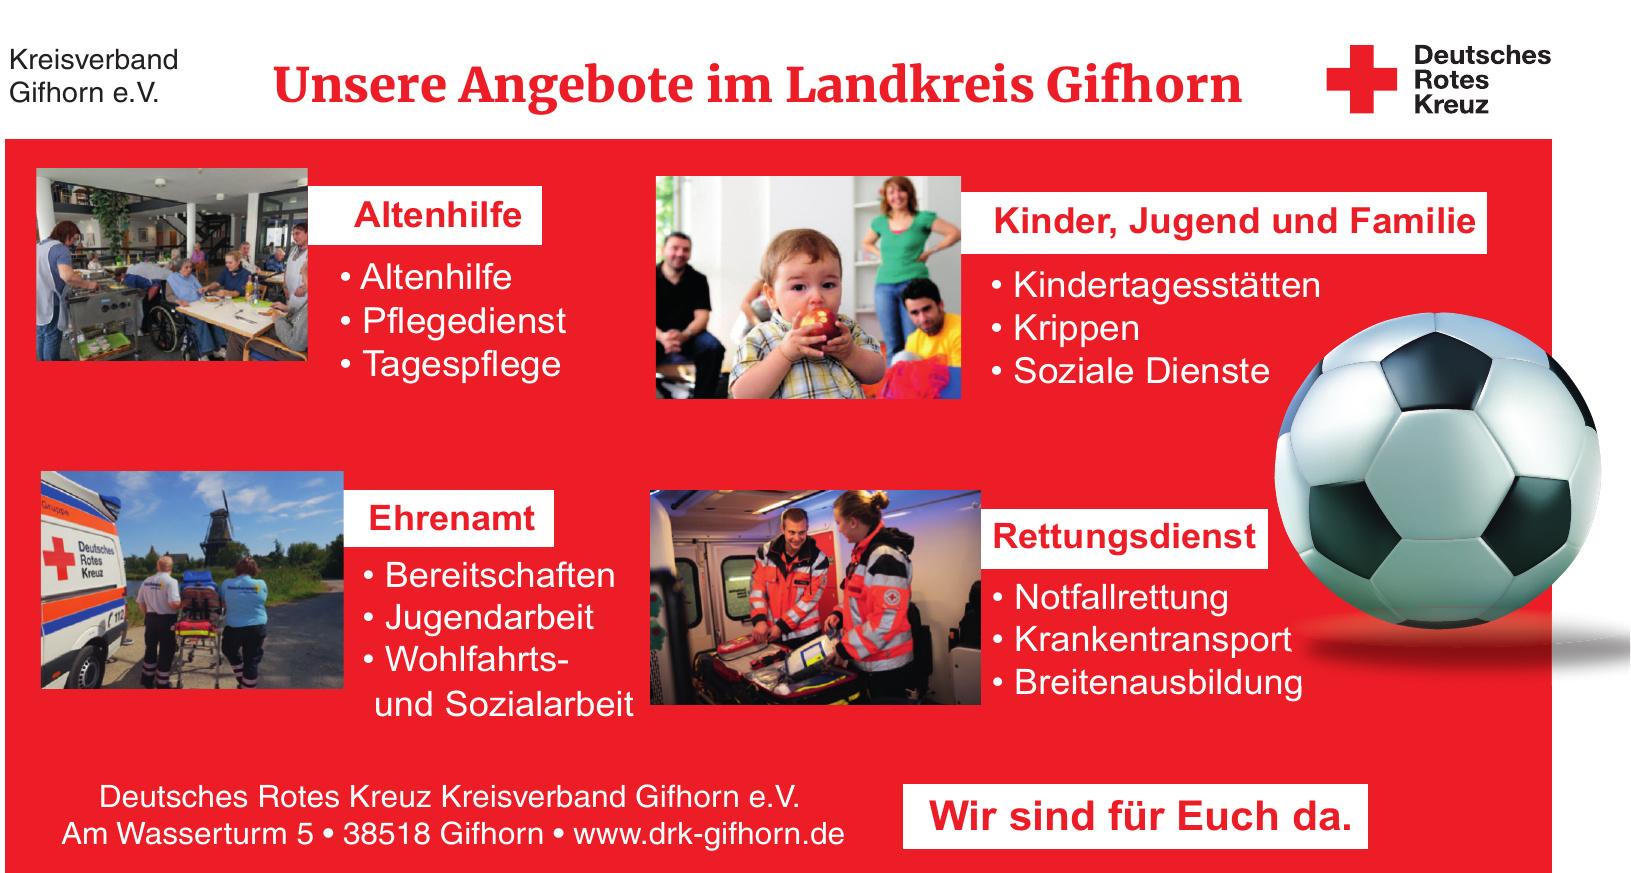 Deutsches Rotes Kreuz, Kreisverband Gifhorn e. V.